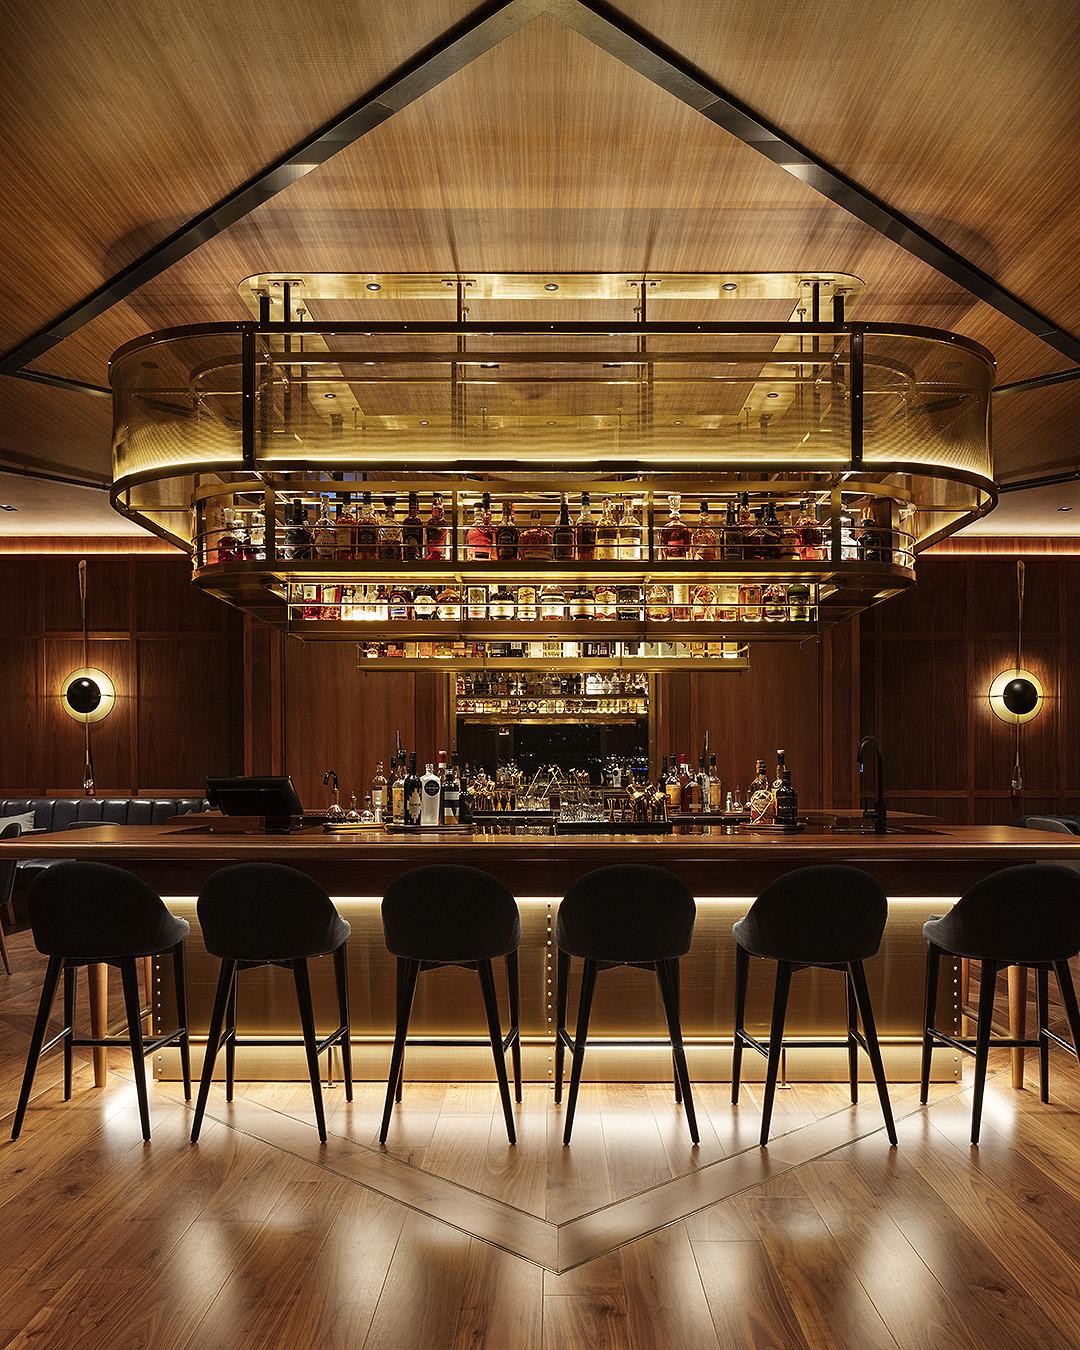 Late night at the swish captain's bar at the Park Hyatt.